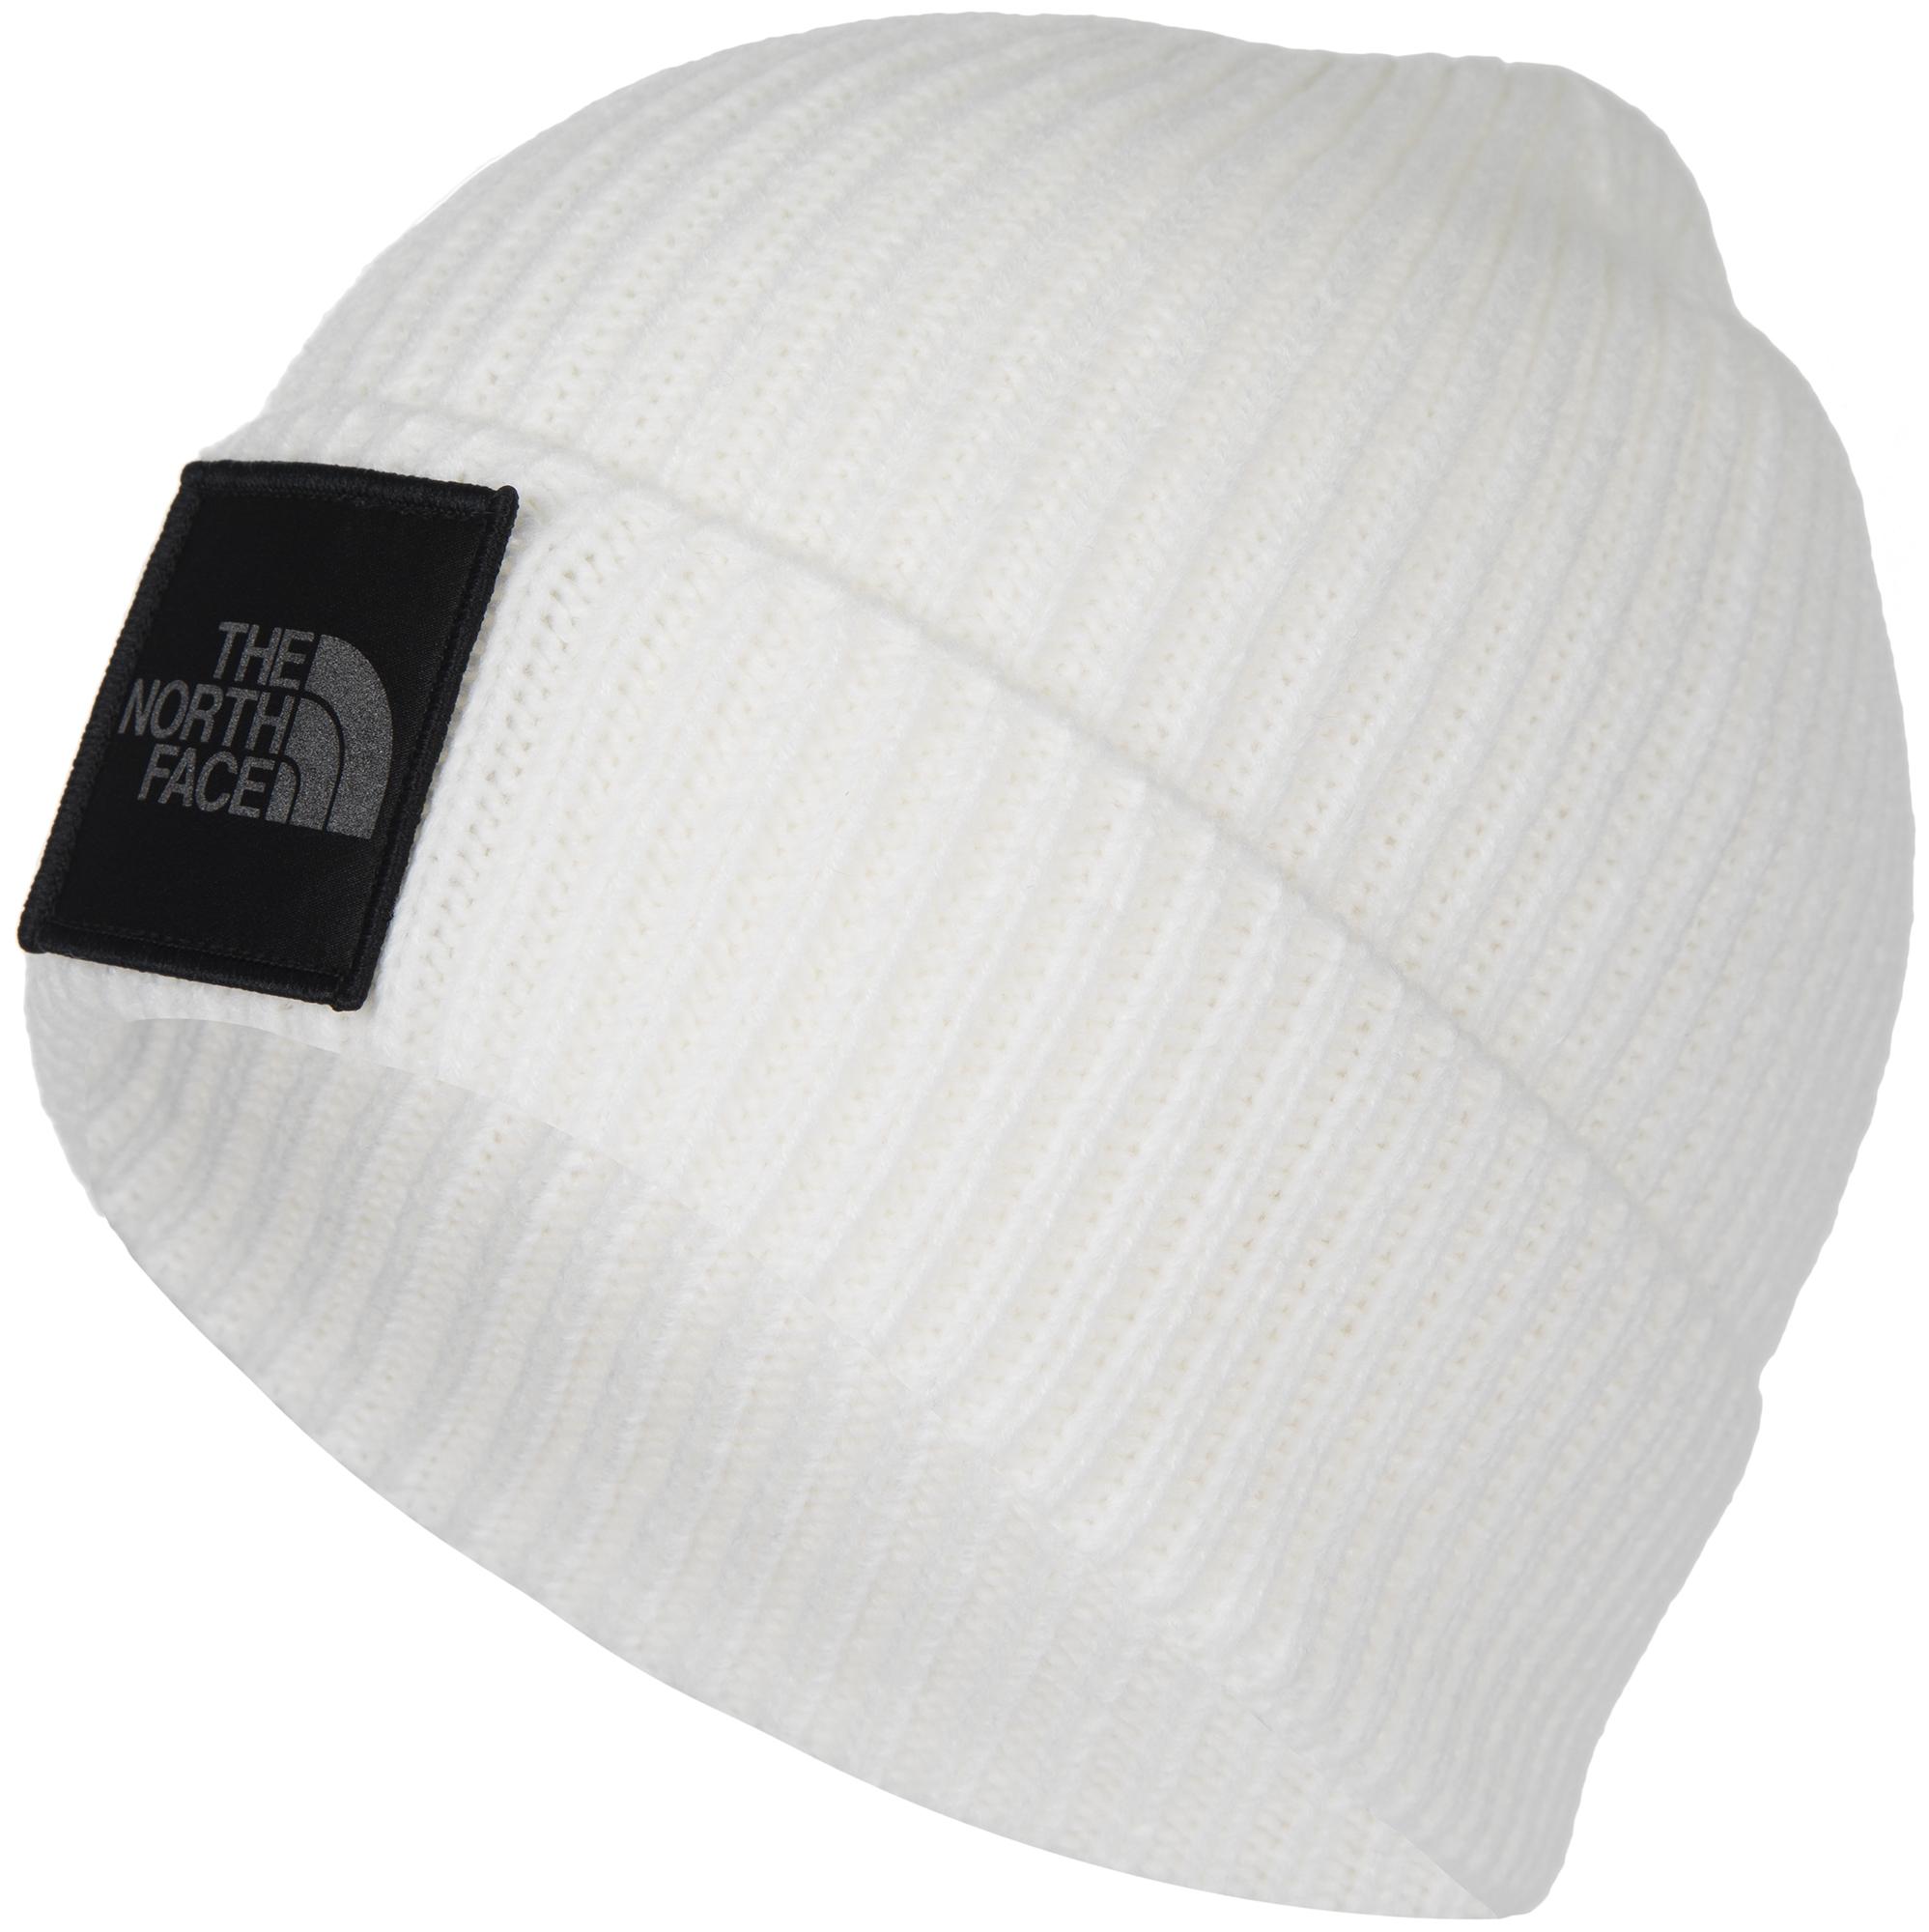 купить The North Face Шапка The North Face Logo Box Cuffed Beanie по цене 2399 рублей